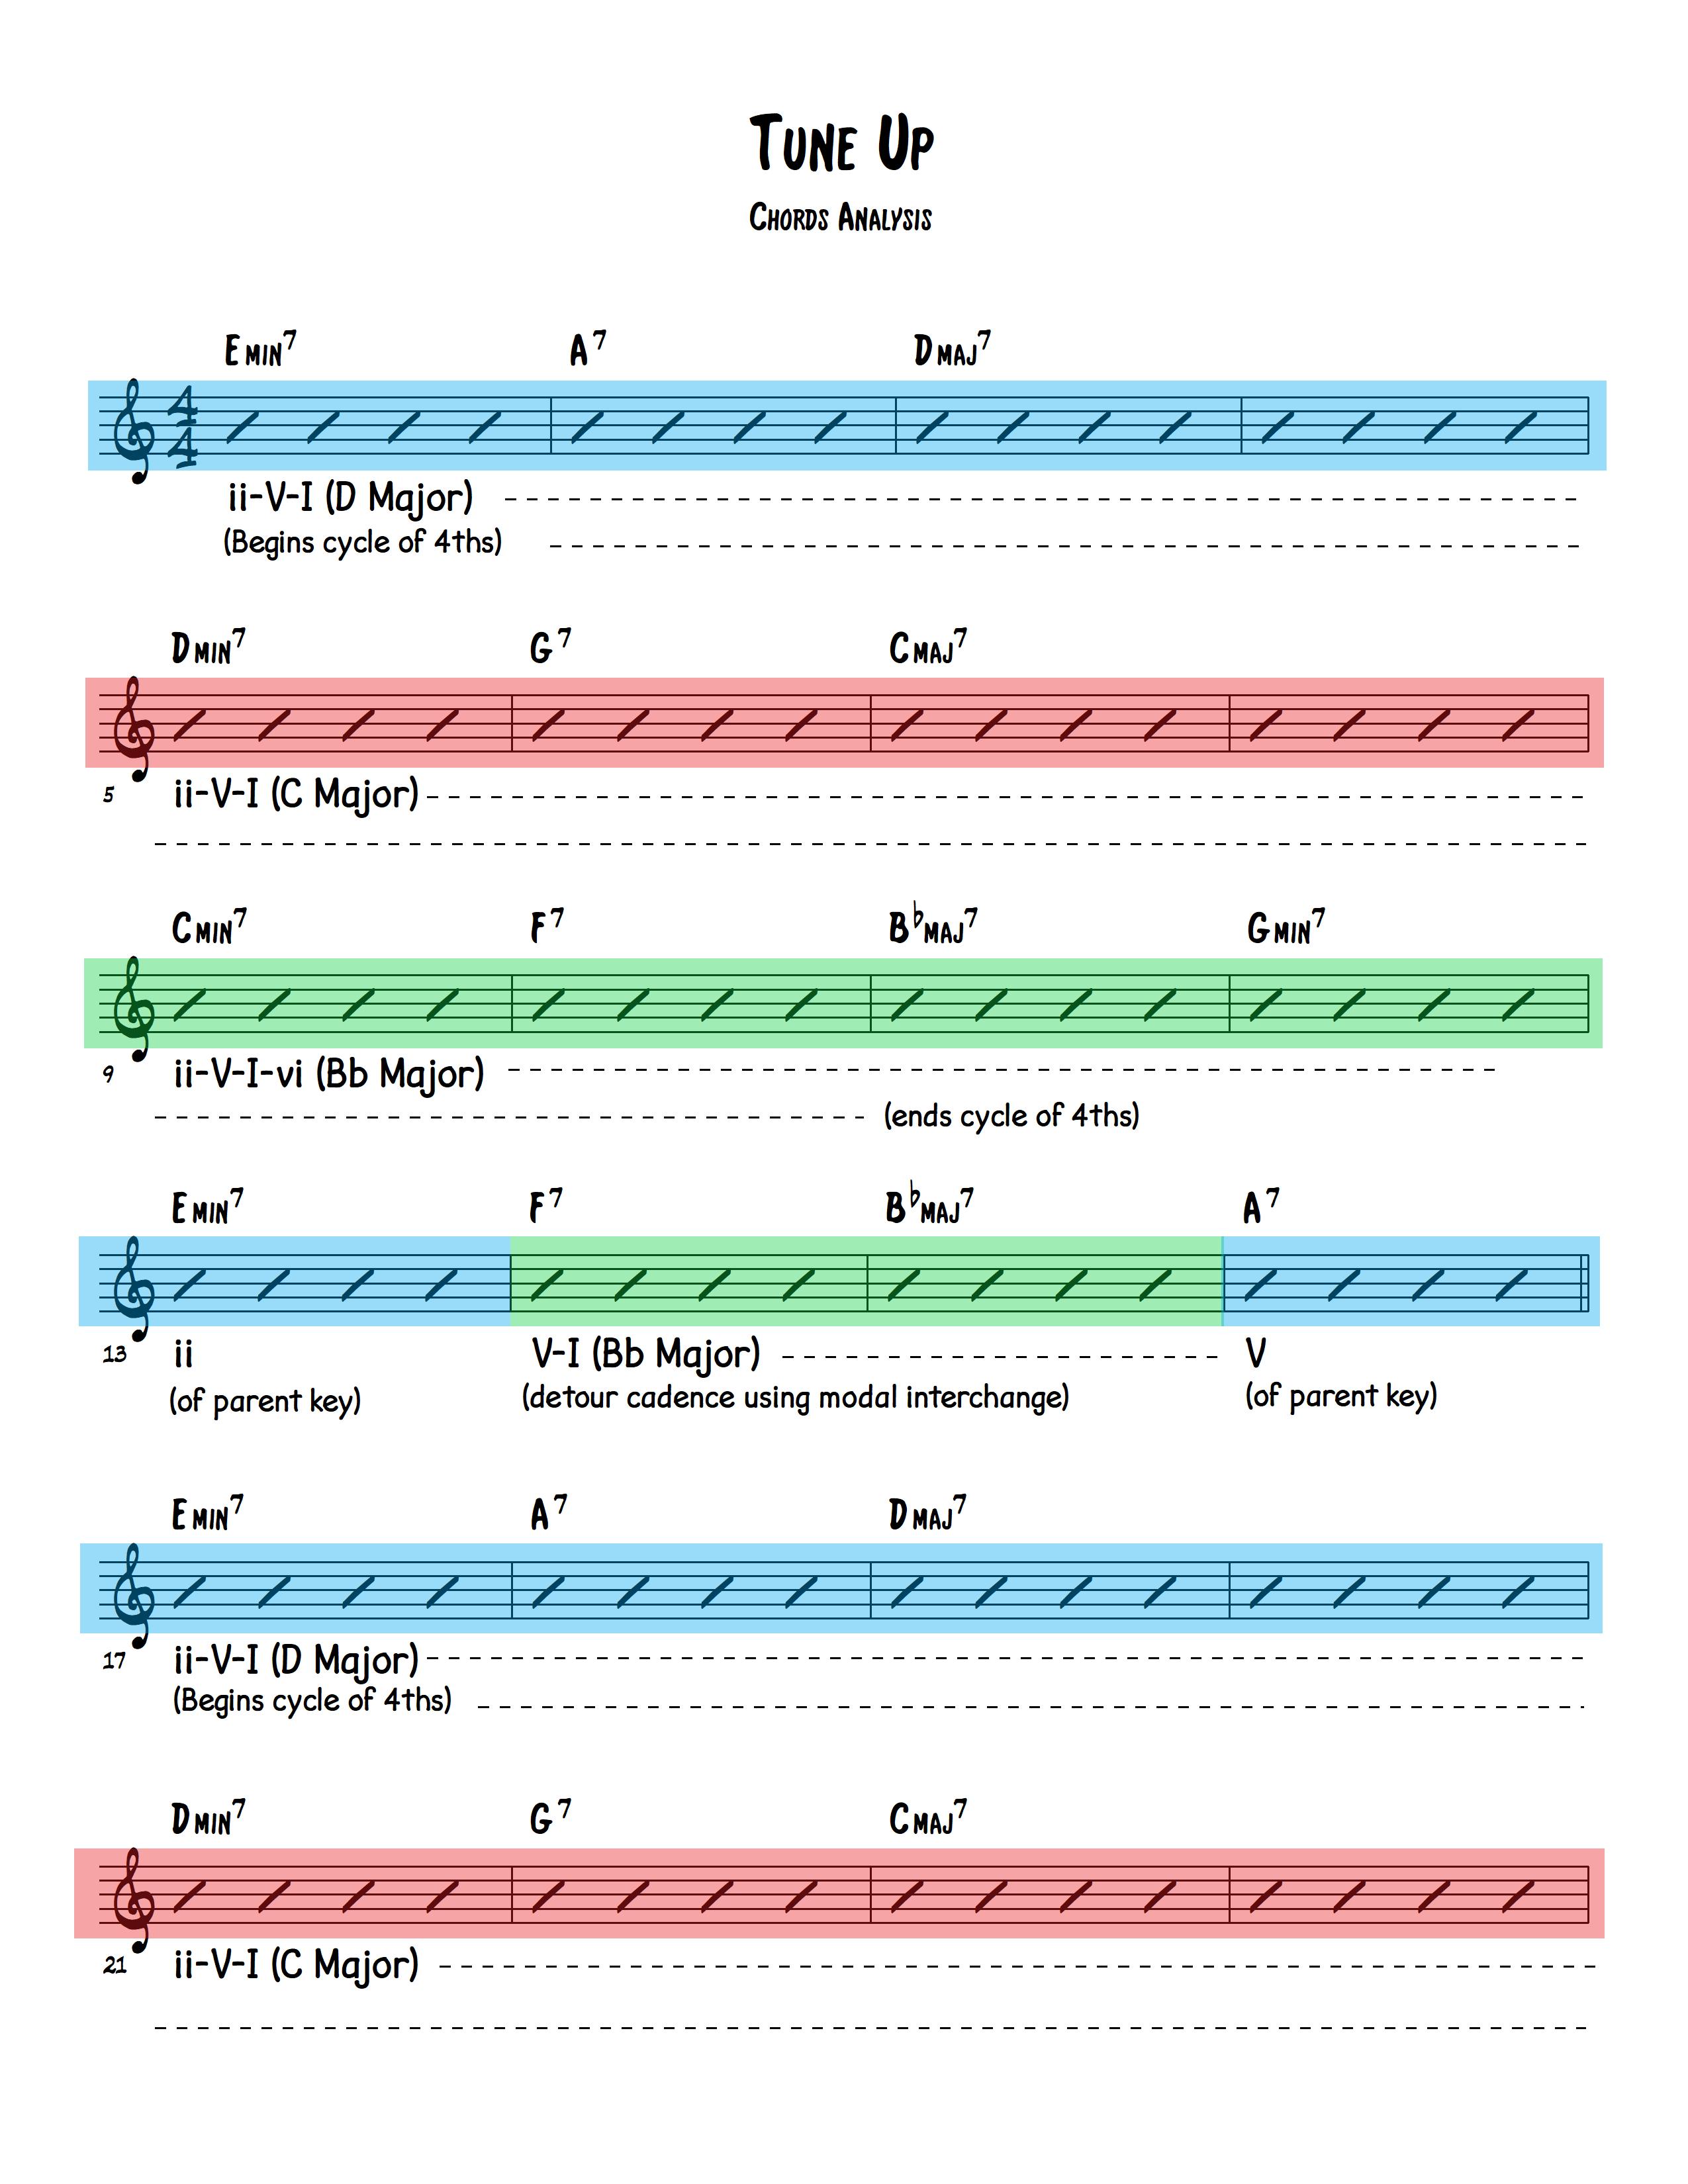 Tune Up (Chords Analysis 1)